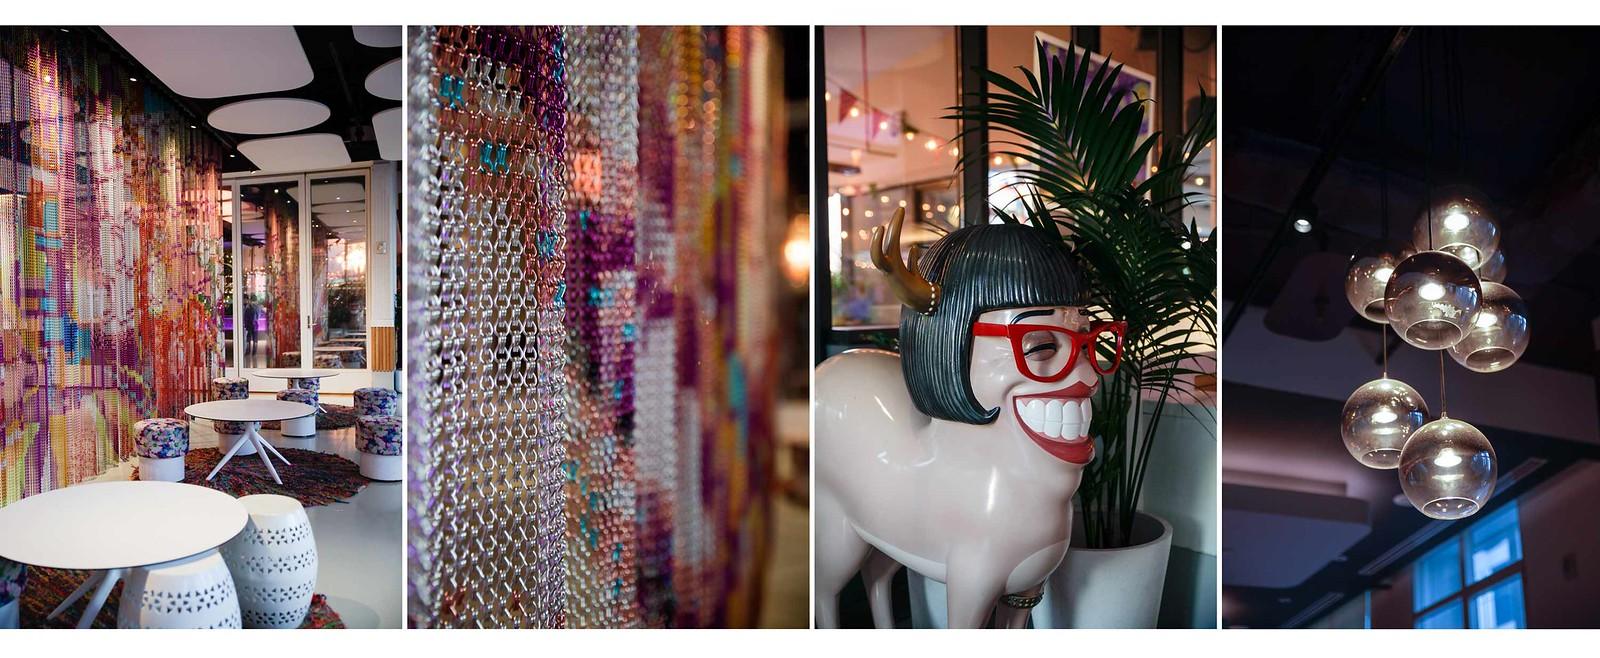 03_yotel_new_york_hotel_futurista_deco_black_mirror